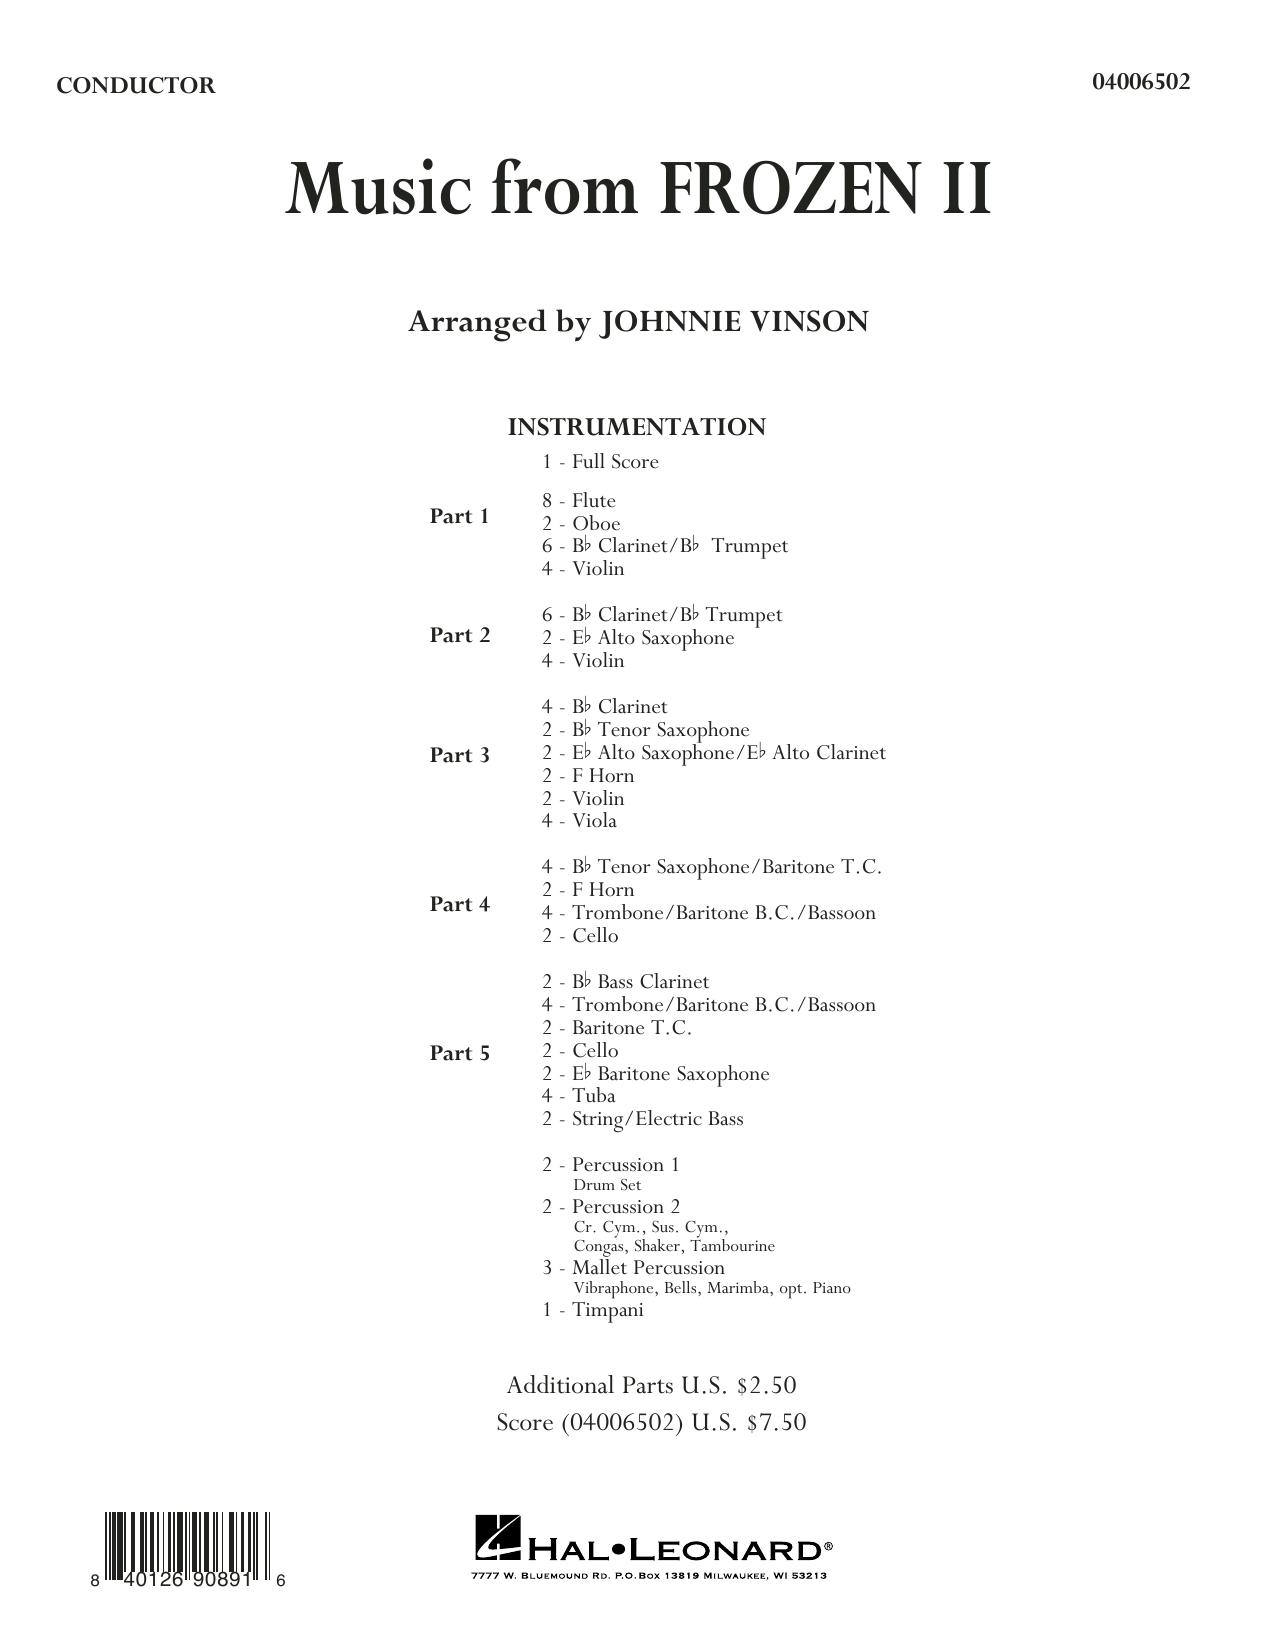 Music from Disney's Frozen 2 (arr. Johnnie Vinson) - Conductor Score (Full Score) Sheet Music